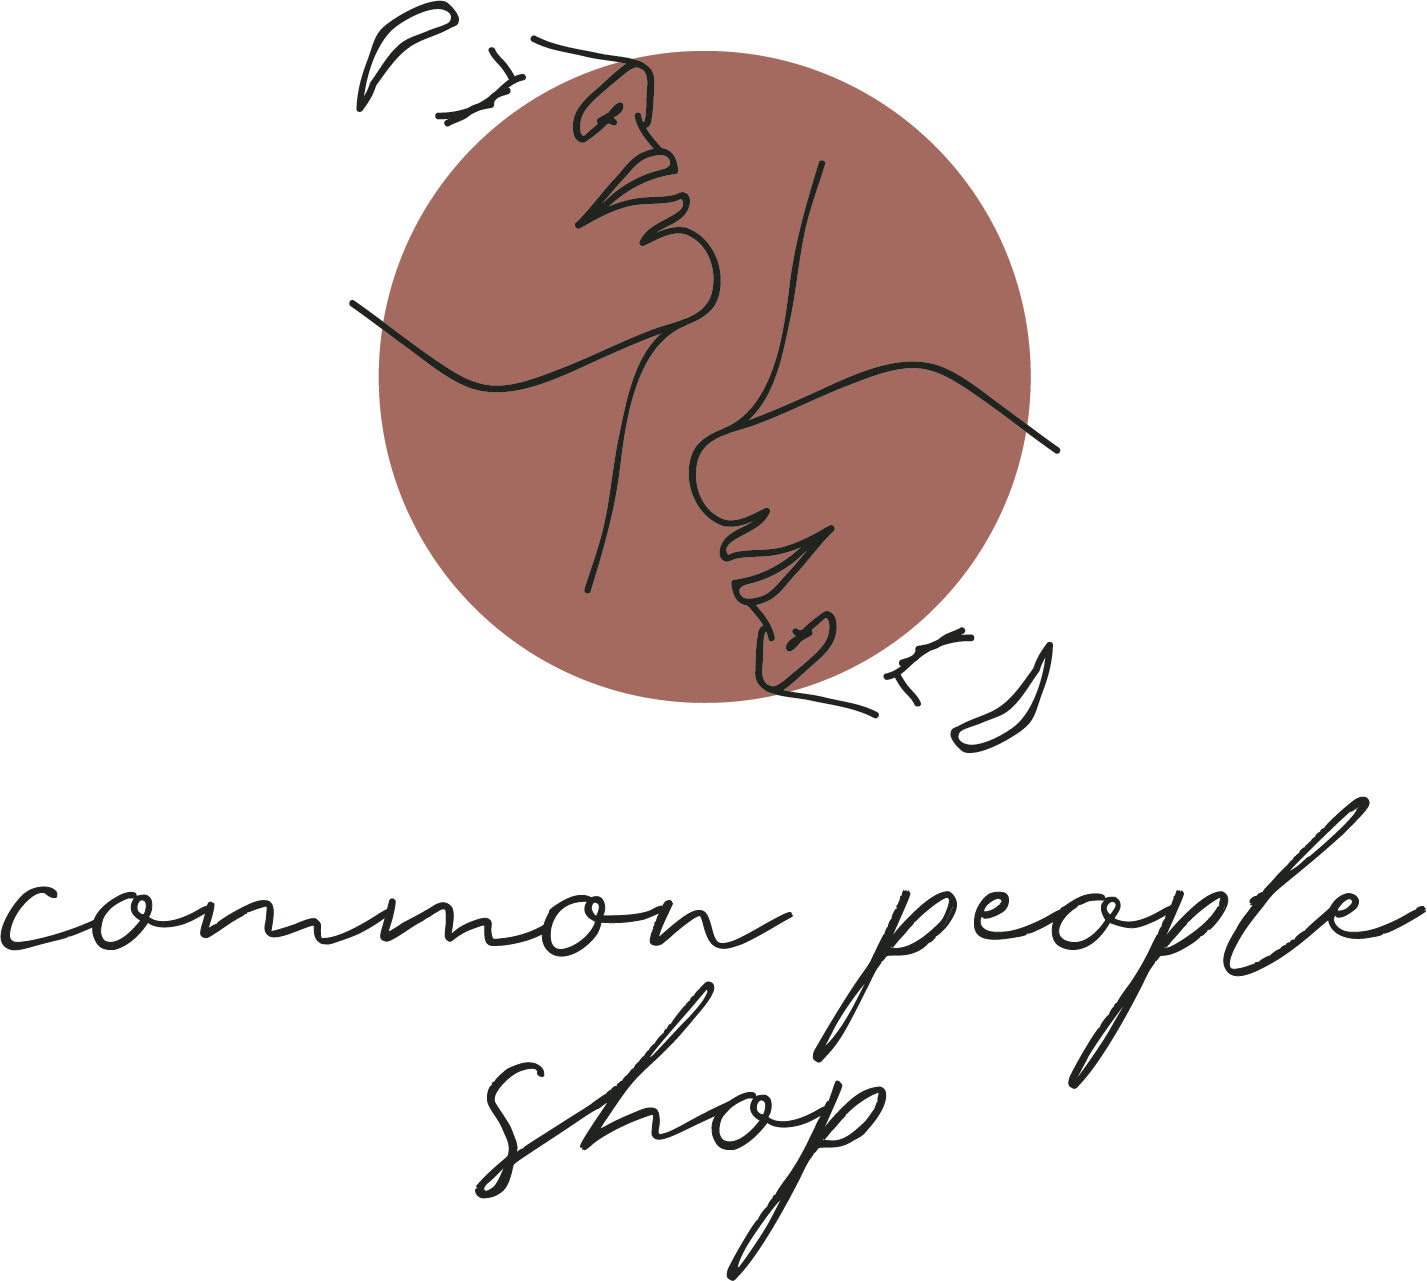 Common People Shop.jpg